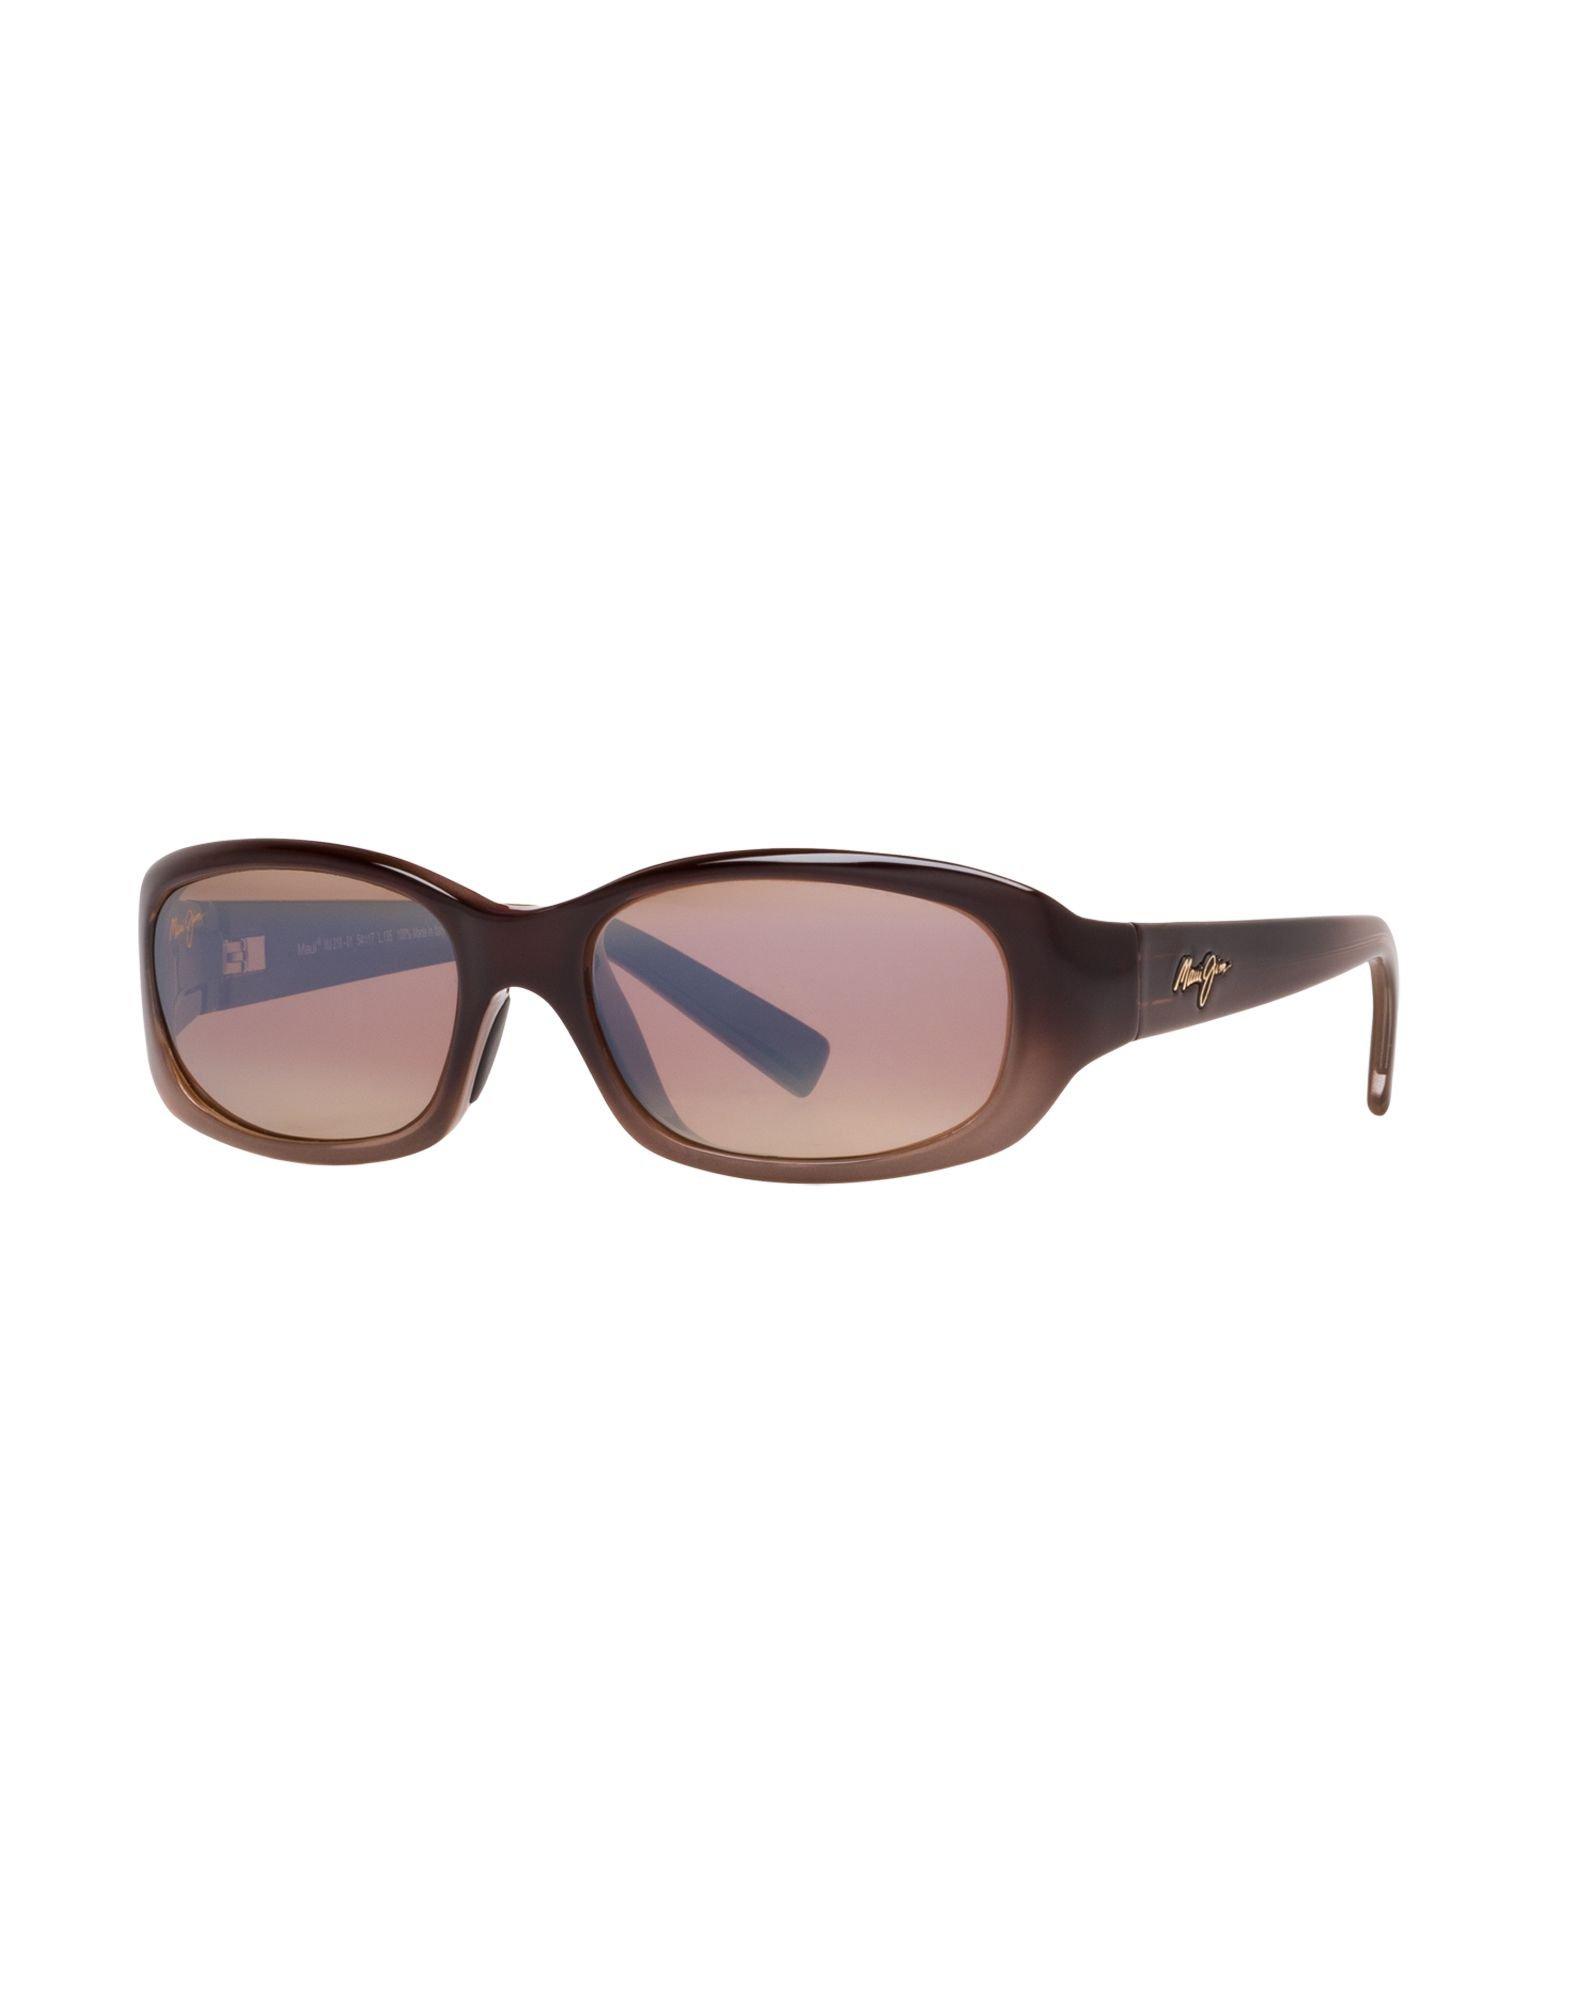 Maui jim Sunglasses in Brown